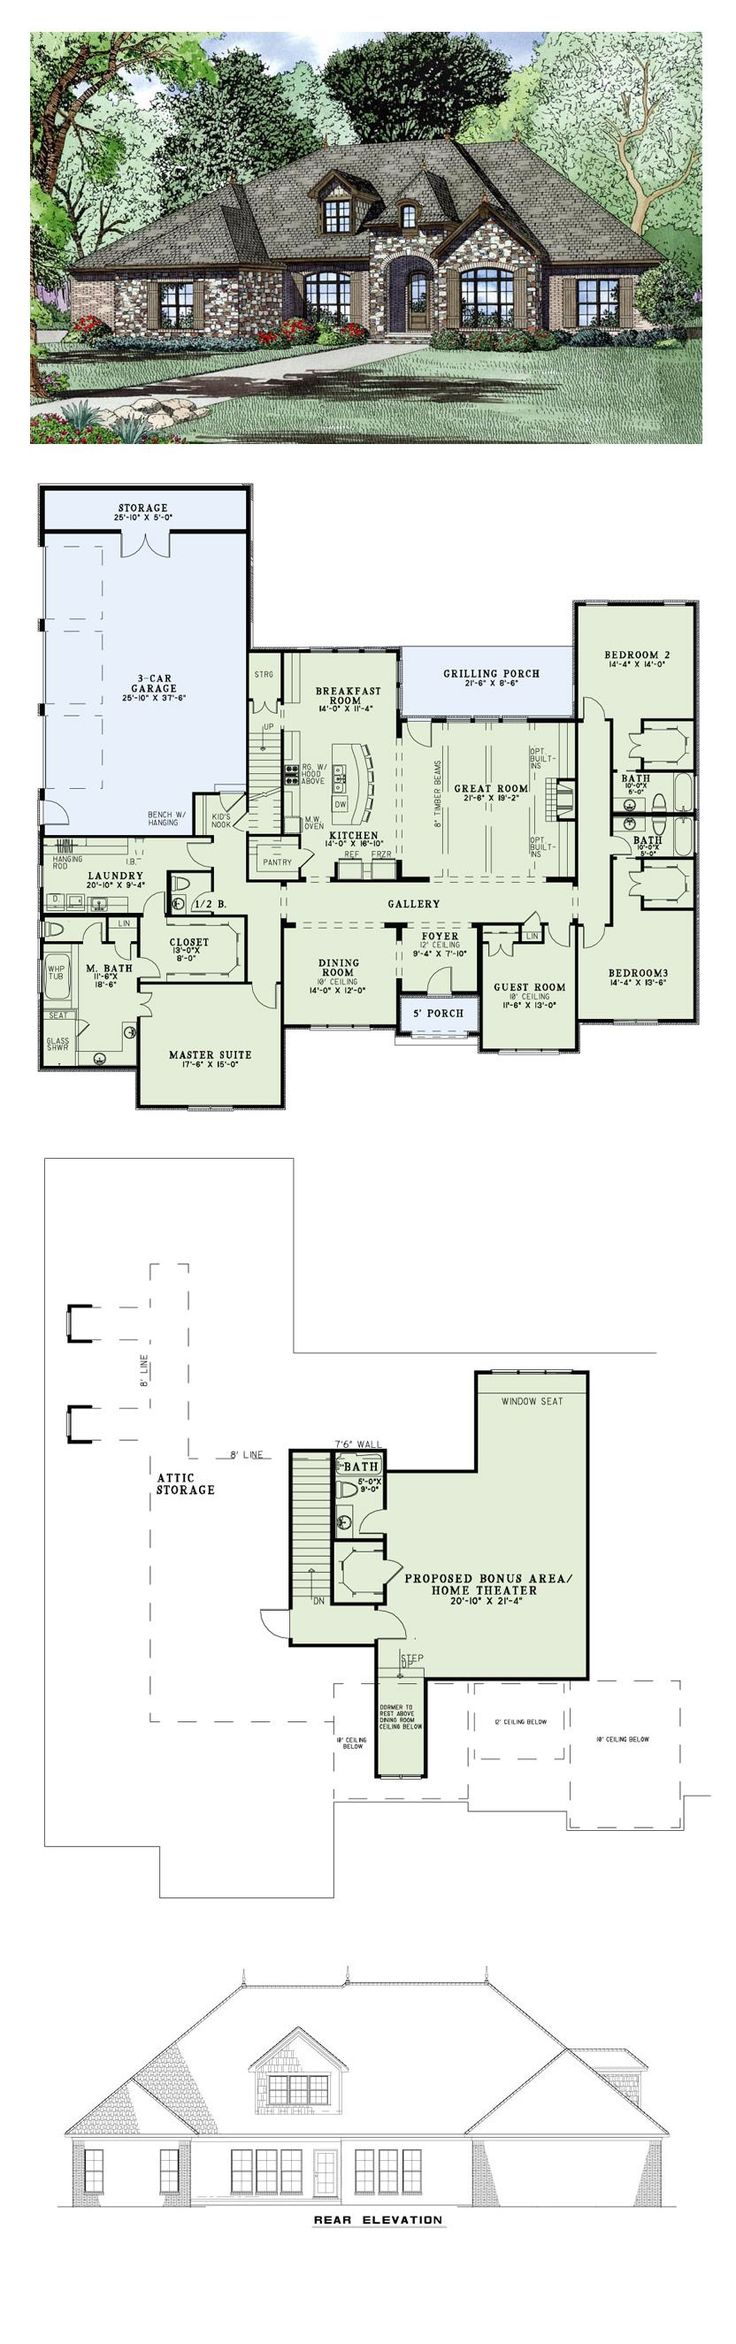 5 master bedroom house plans   best House Plans images on Pinterest  House blueprints Future